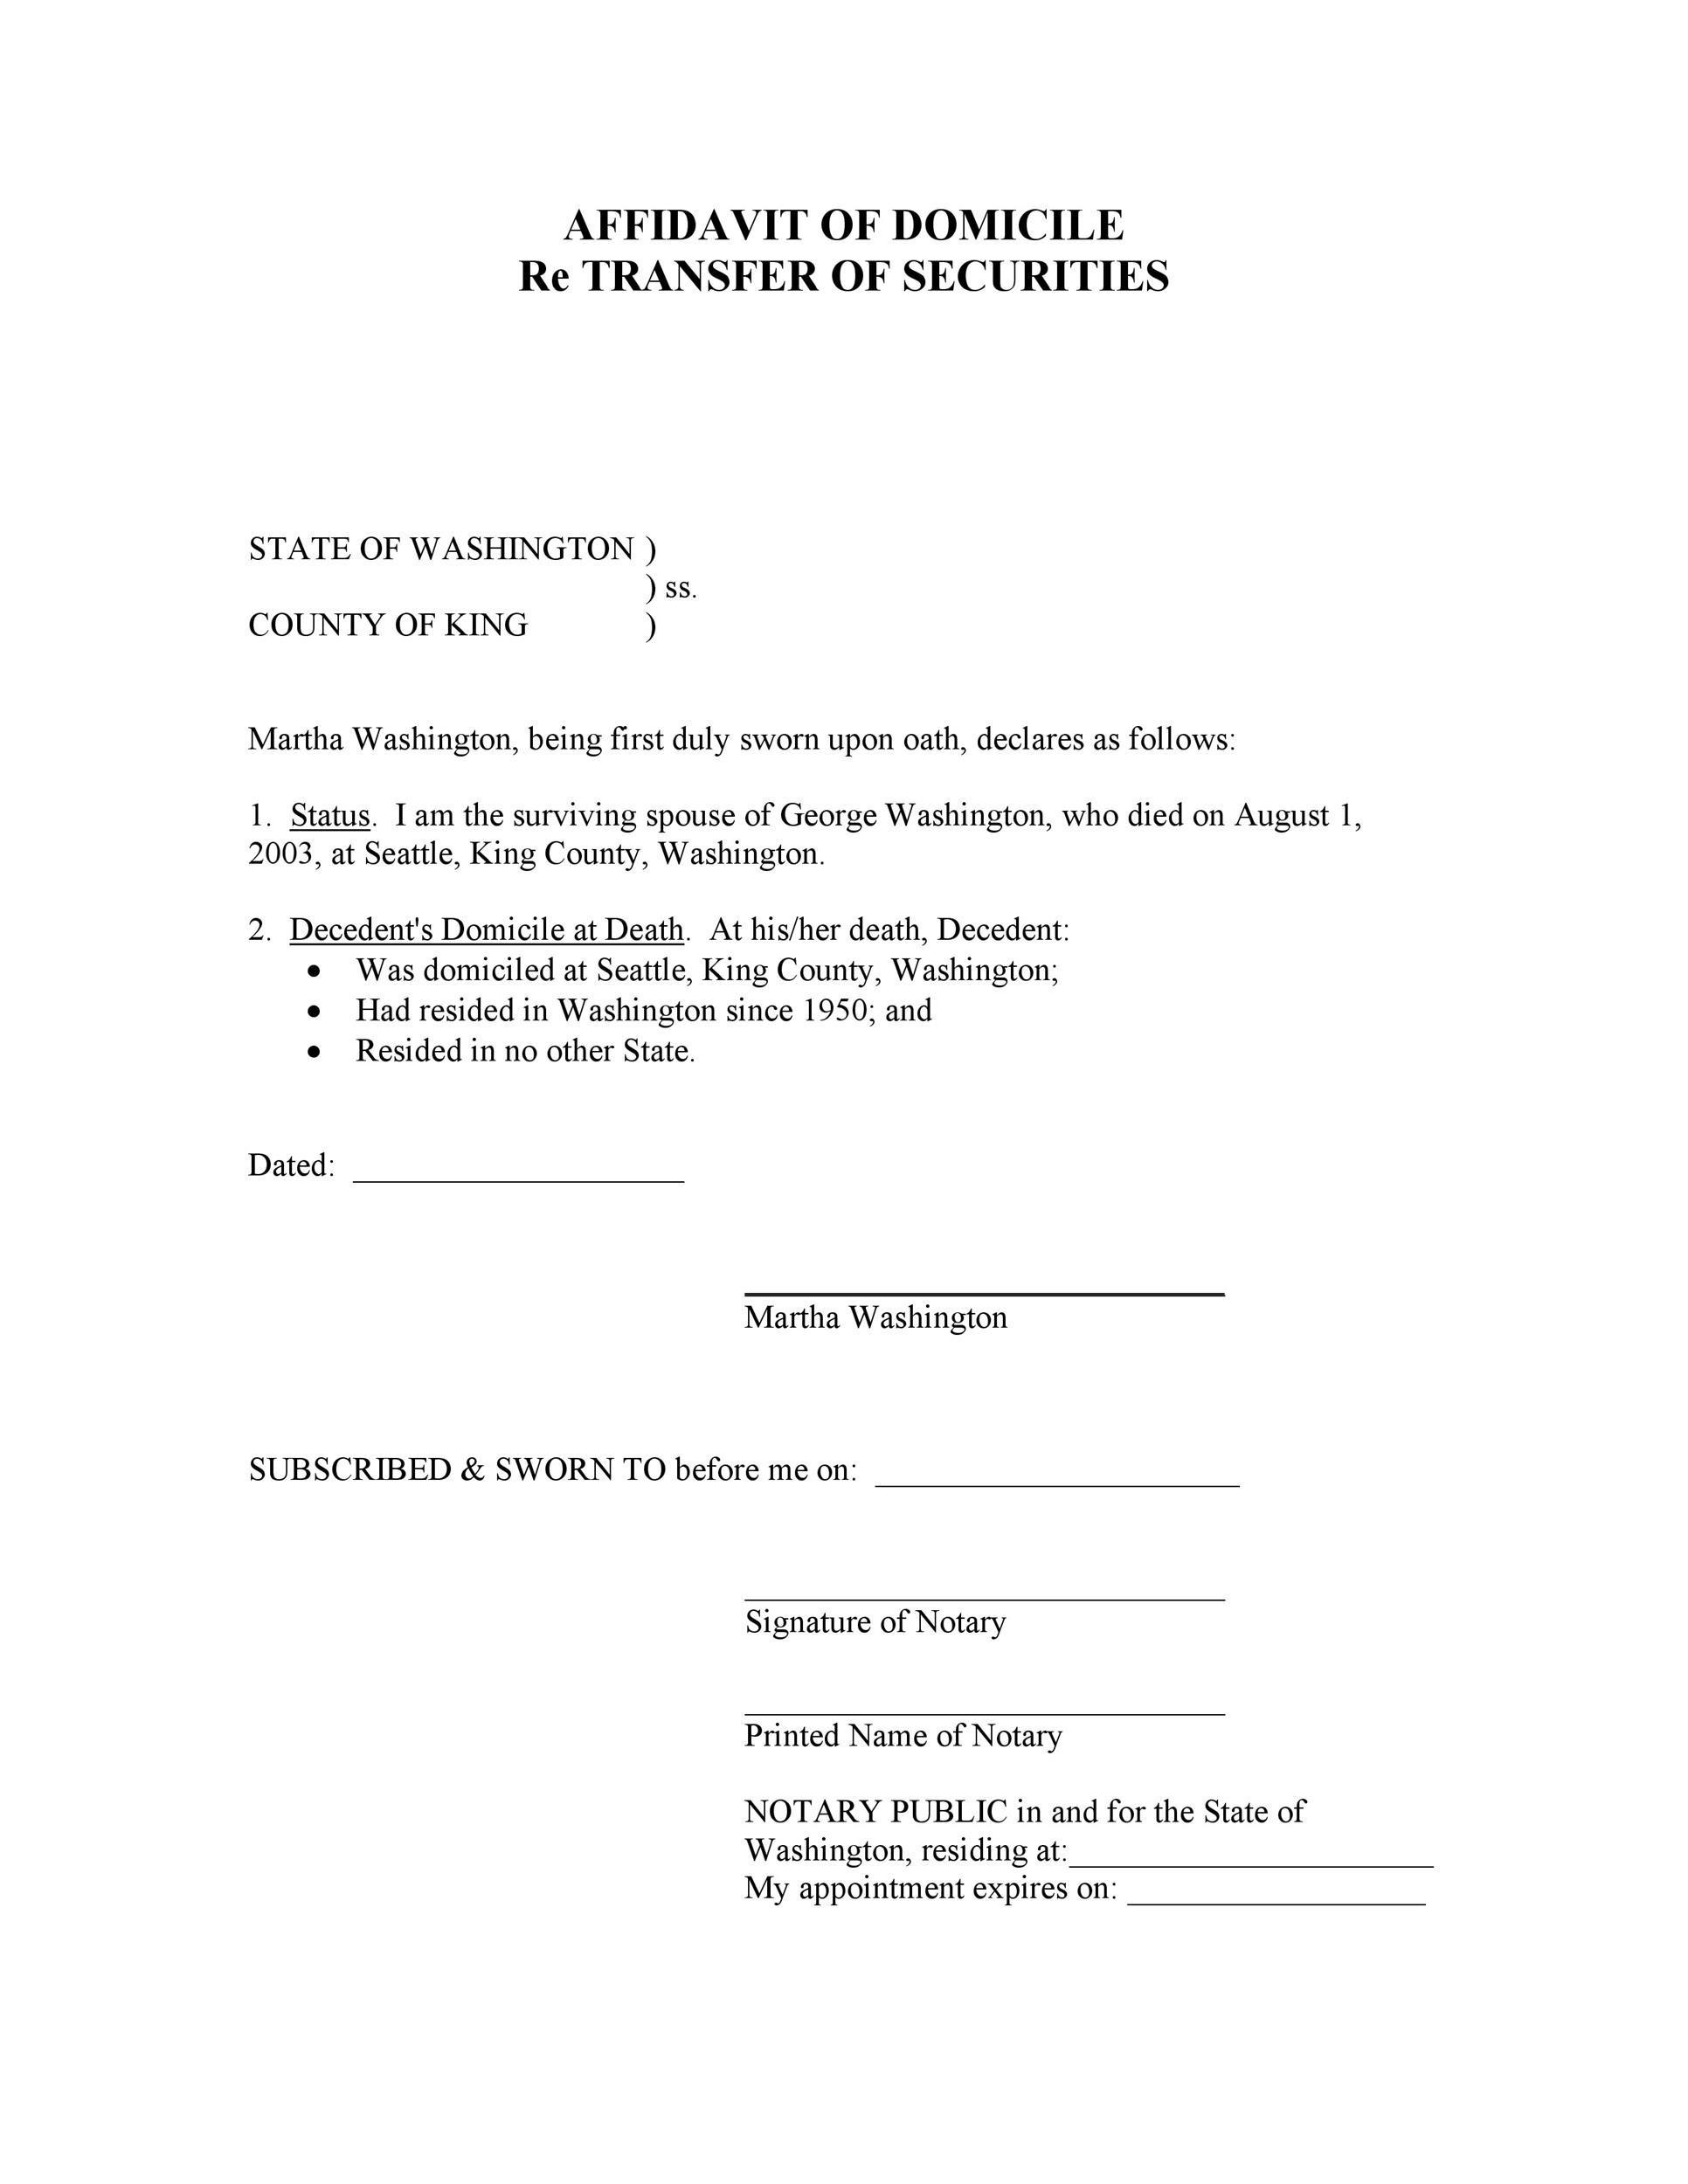 Free affidavit of domicile 04